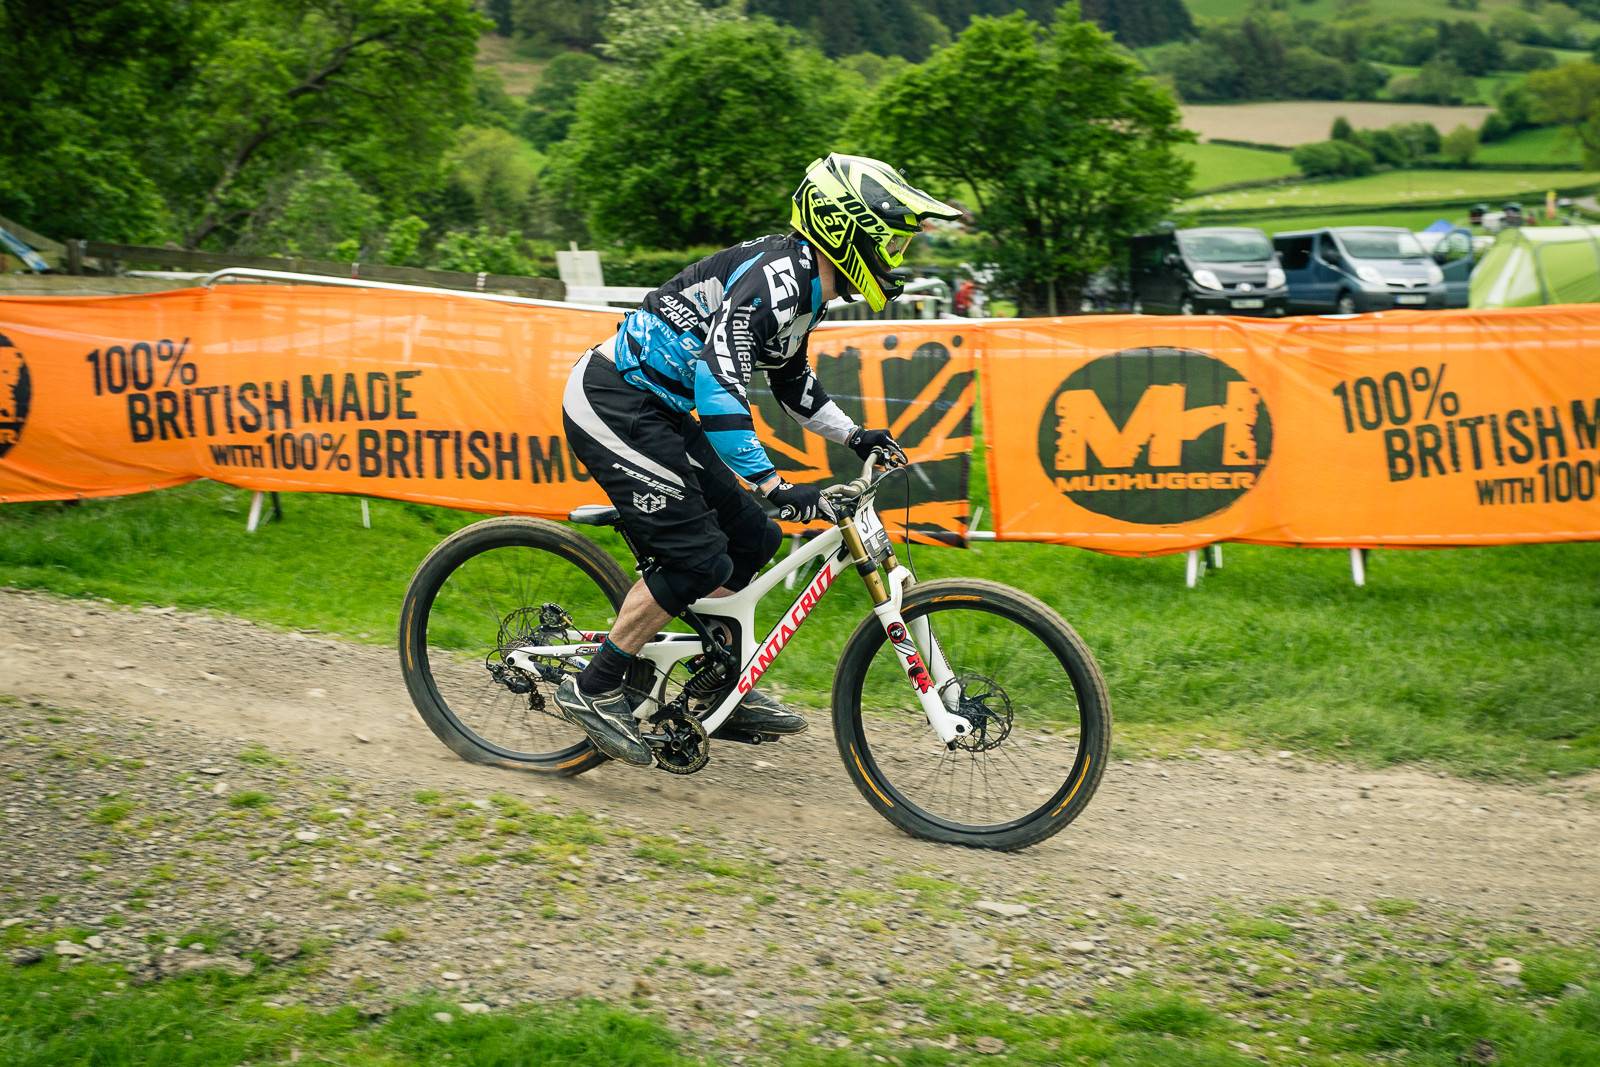 Santa Cruz V10 G-ed Out at Llangollen - G-Out Project - Llangollen BDS 2015 - Mountain Biking Pictures - Vital MTB